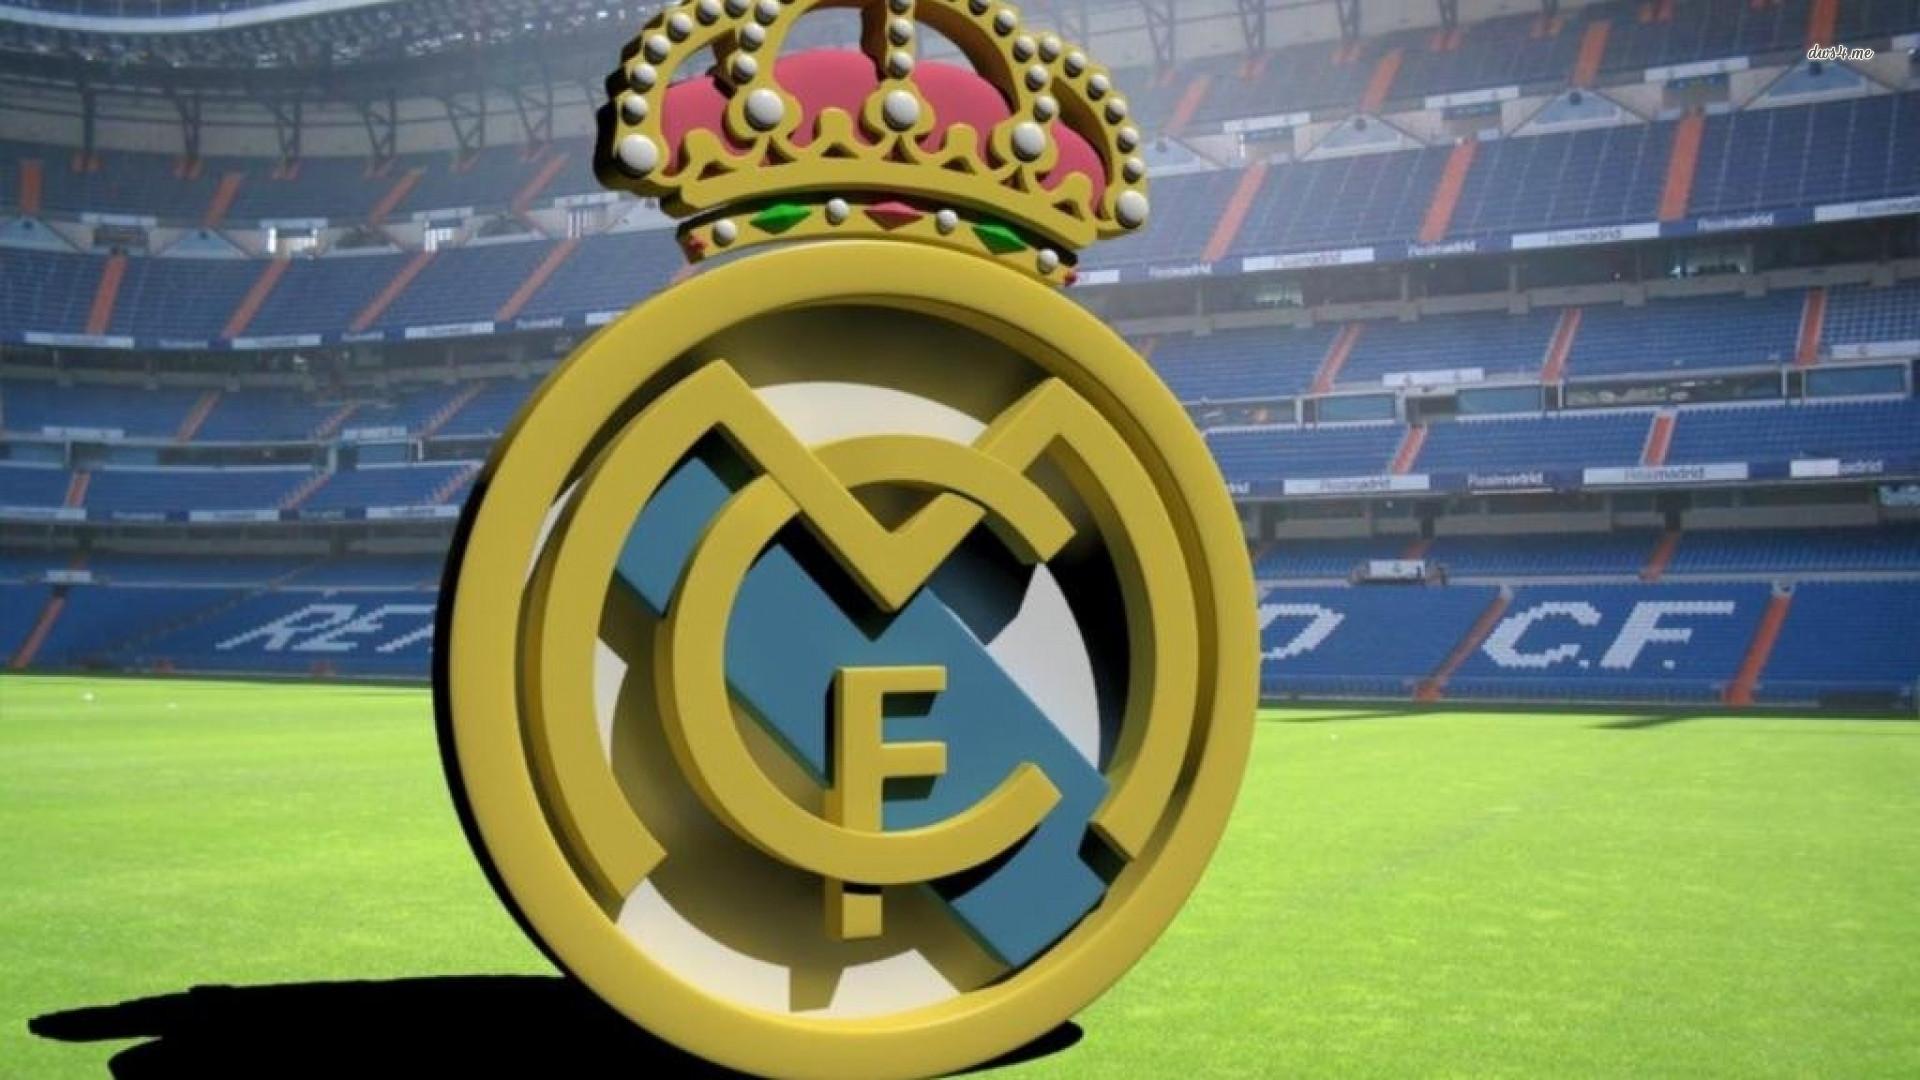 Real Madrid Logo Wallpaper HD 1920x1080